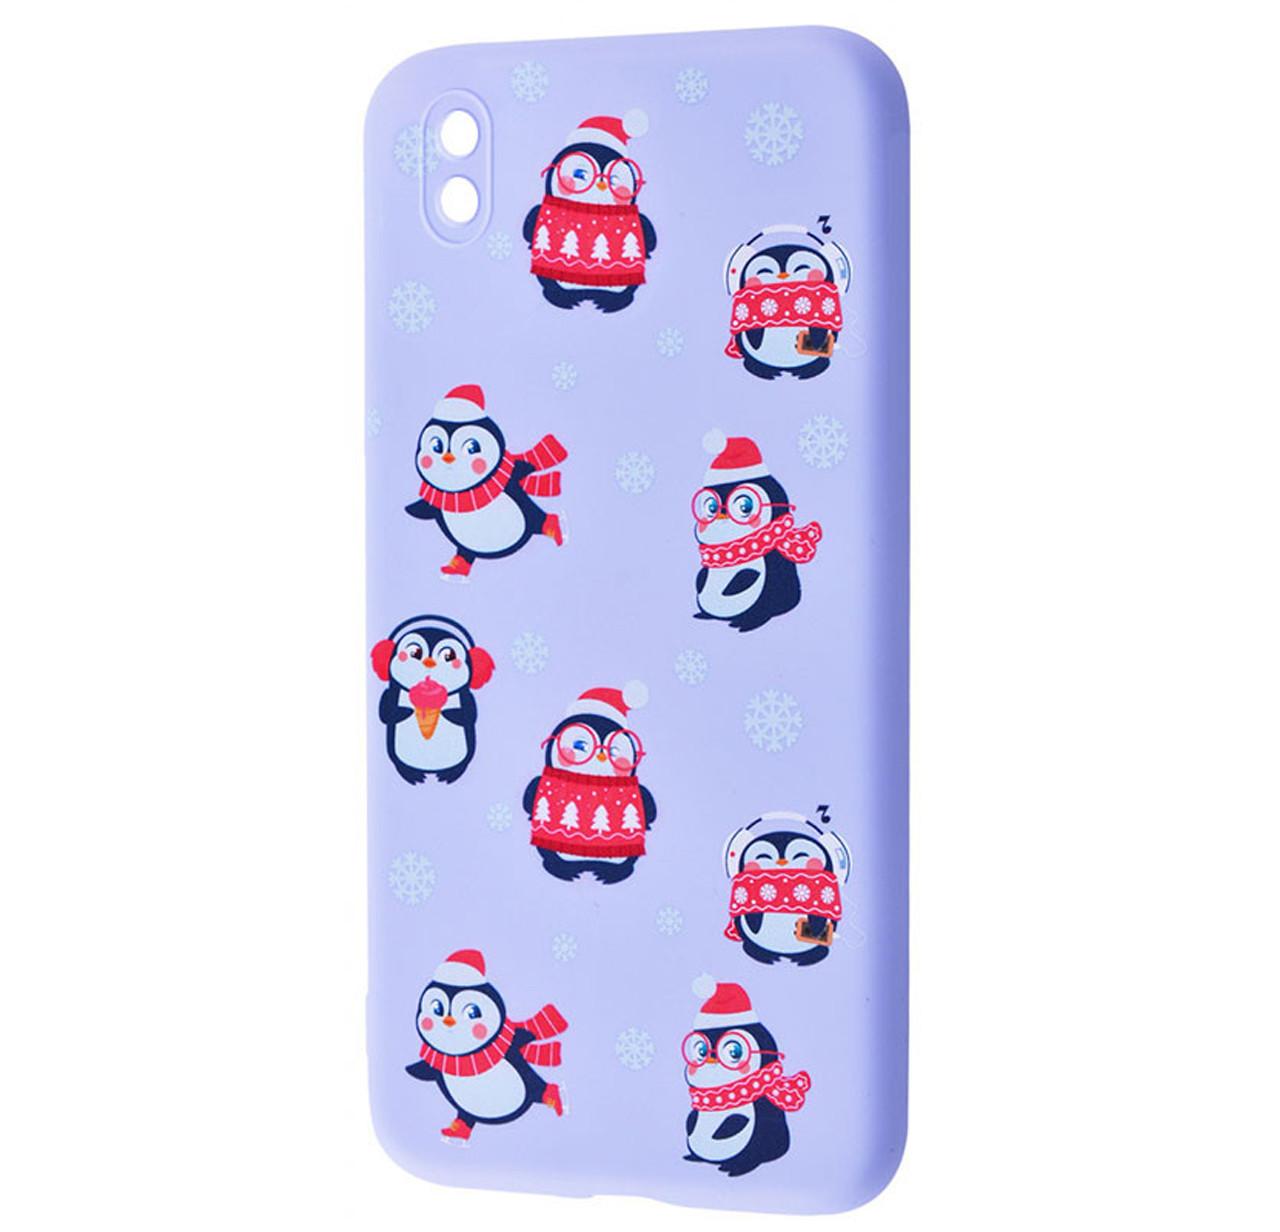 Чехол-накладка TPU WAVE Fancy Case для Samsung Galaxy A01 Core SM-A013F Light Purple (Penguins)